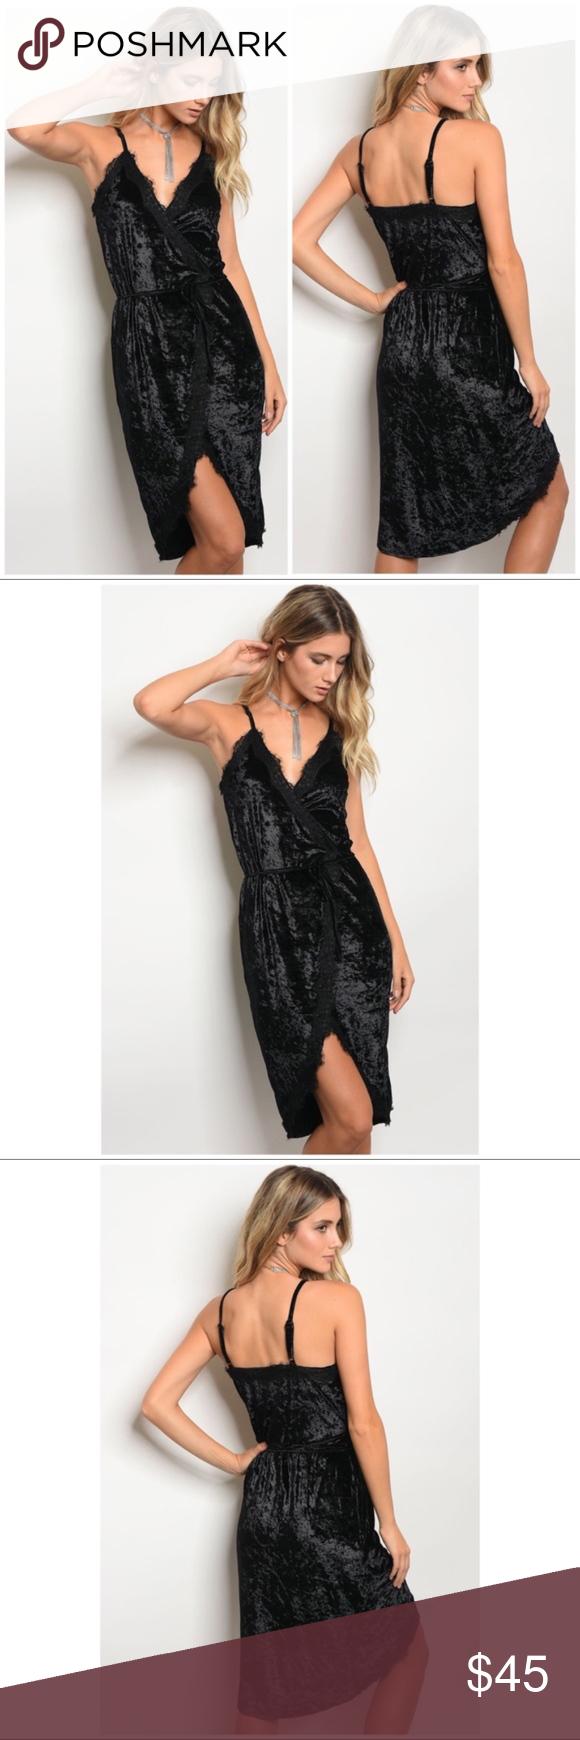 Black crushed velvet lace wrap midi prom dress boutique wrap style